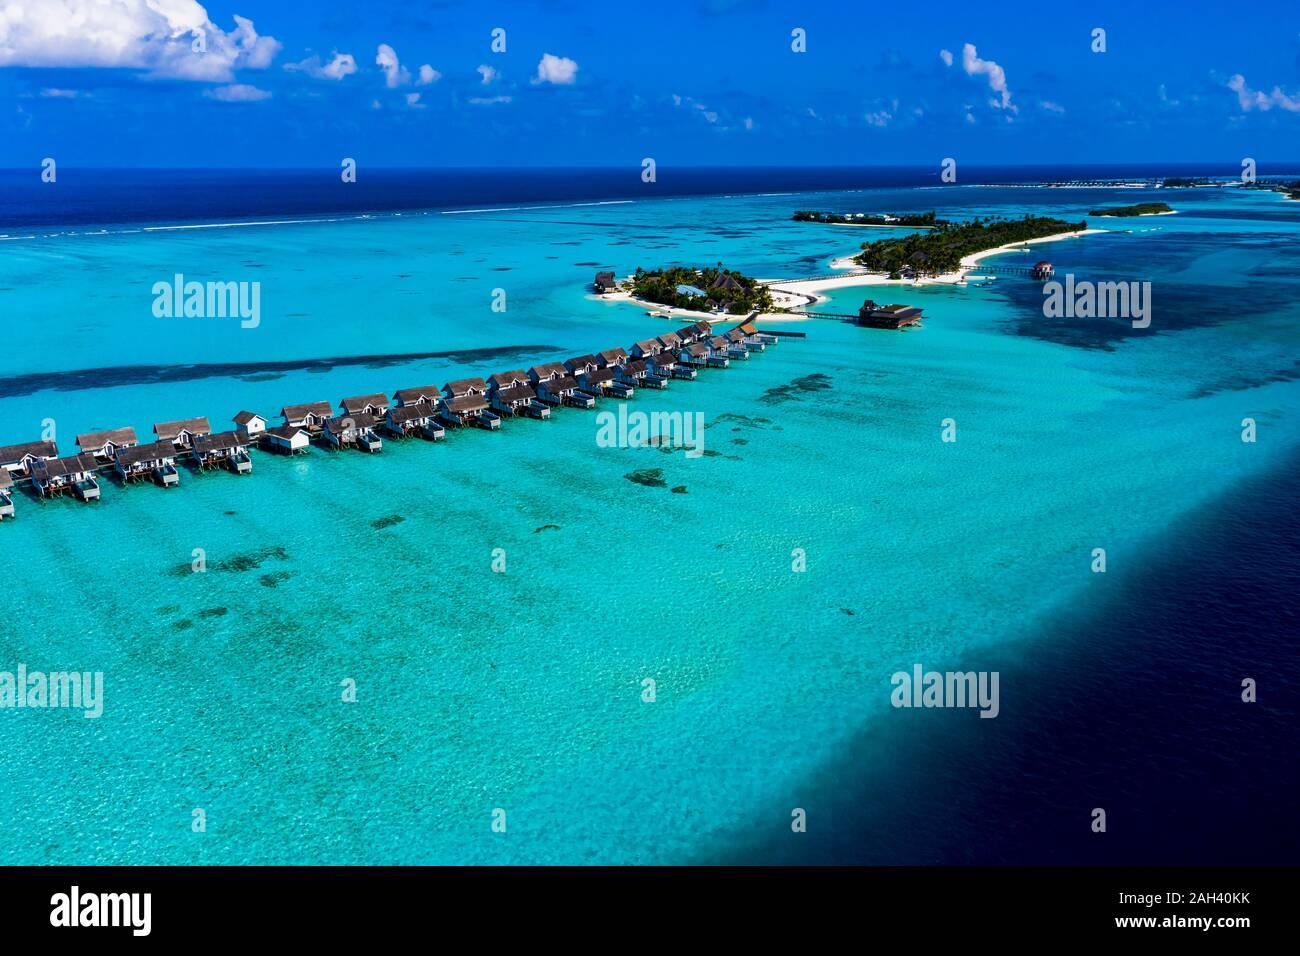 Maldives, South Male Atoll, Kaafu Atoll, Aerial view of Bungalows on sea Stock Photo